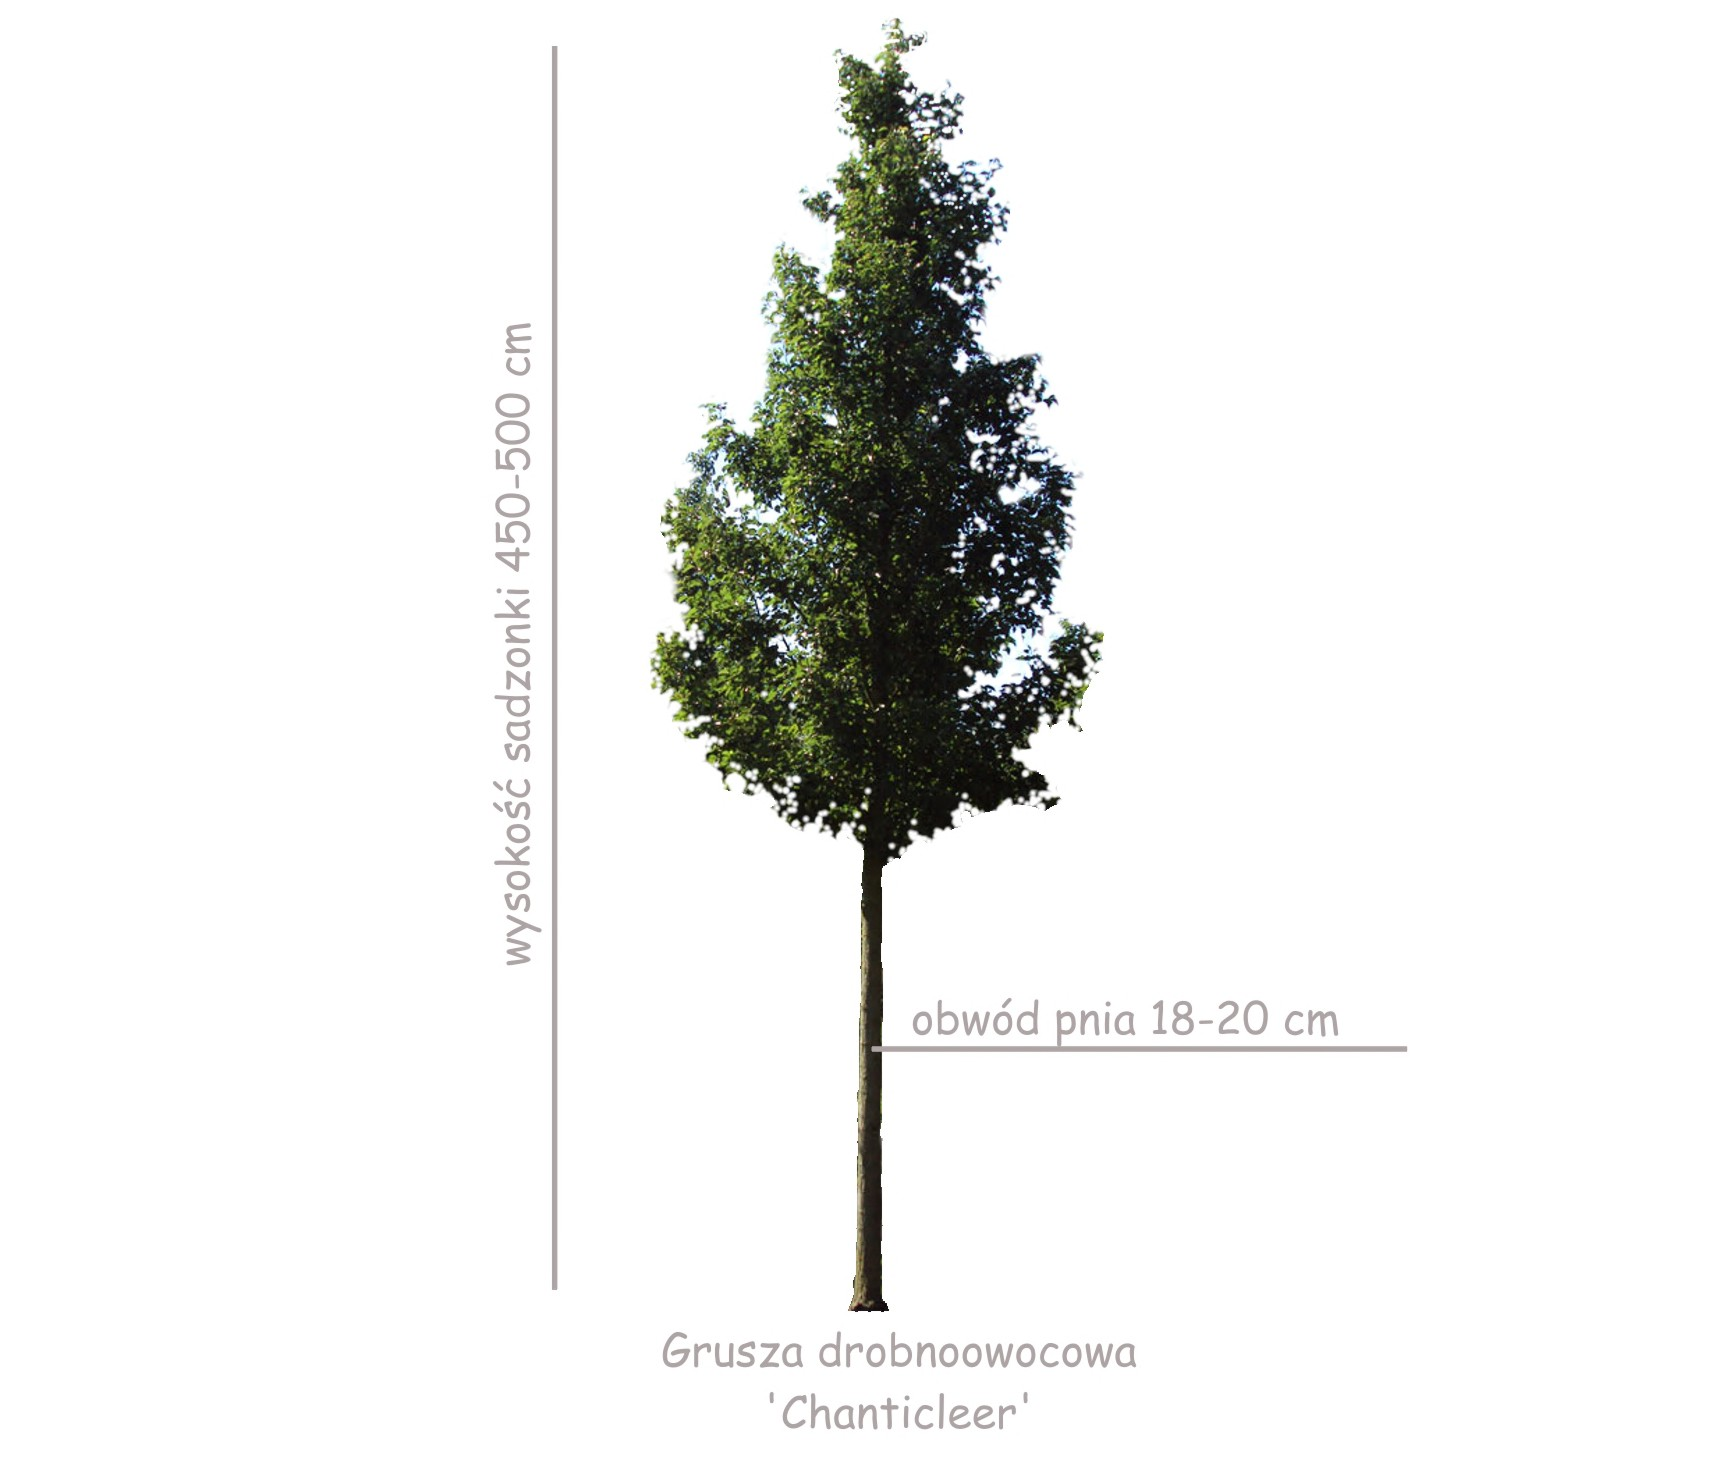 Grusza drobnoowocowa 'Chanticleer' duża sadzonka, obwód pnia 18-20 cm.